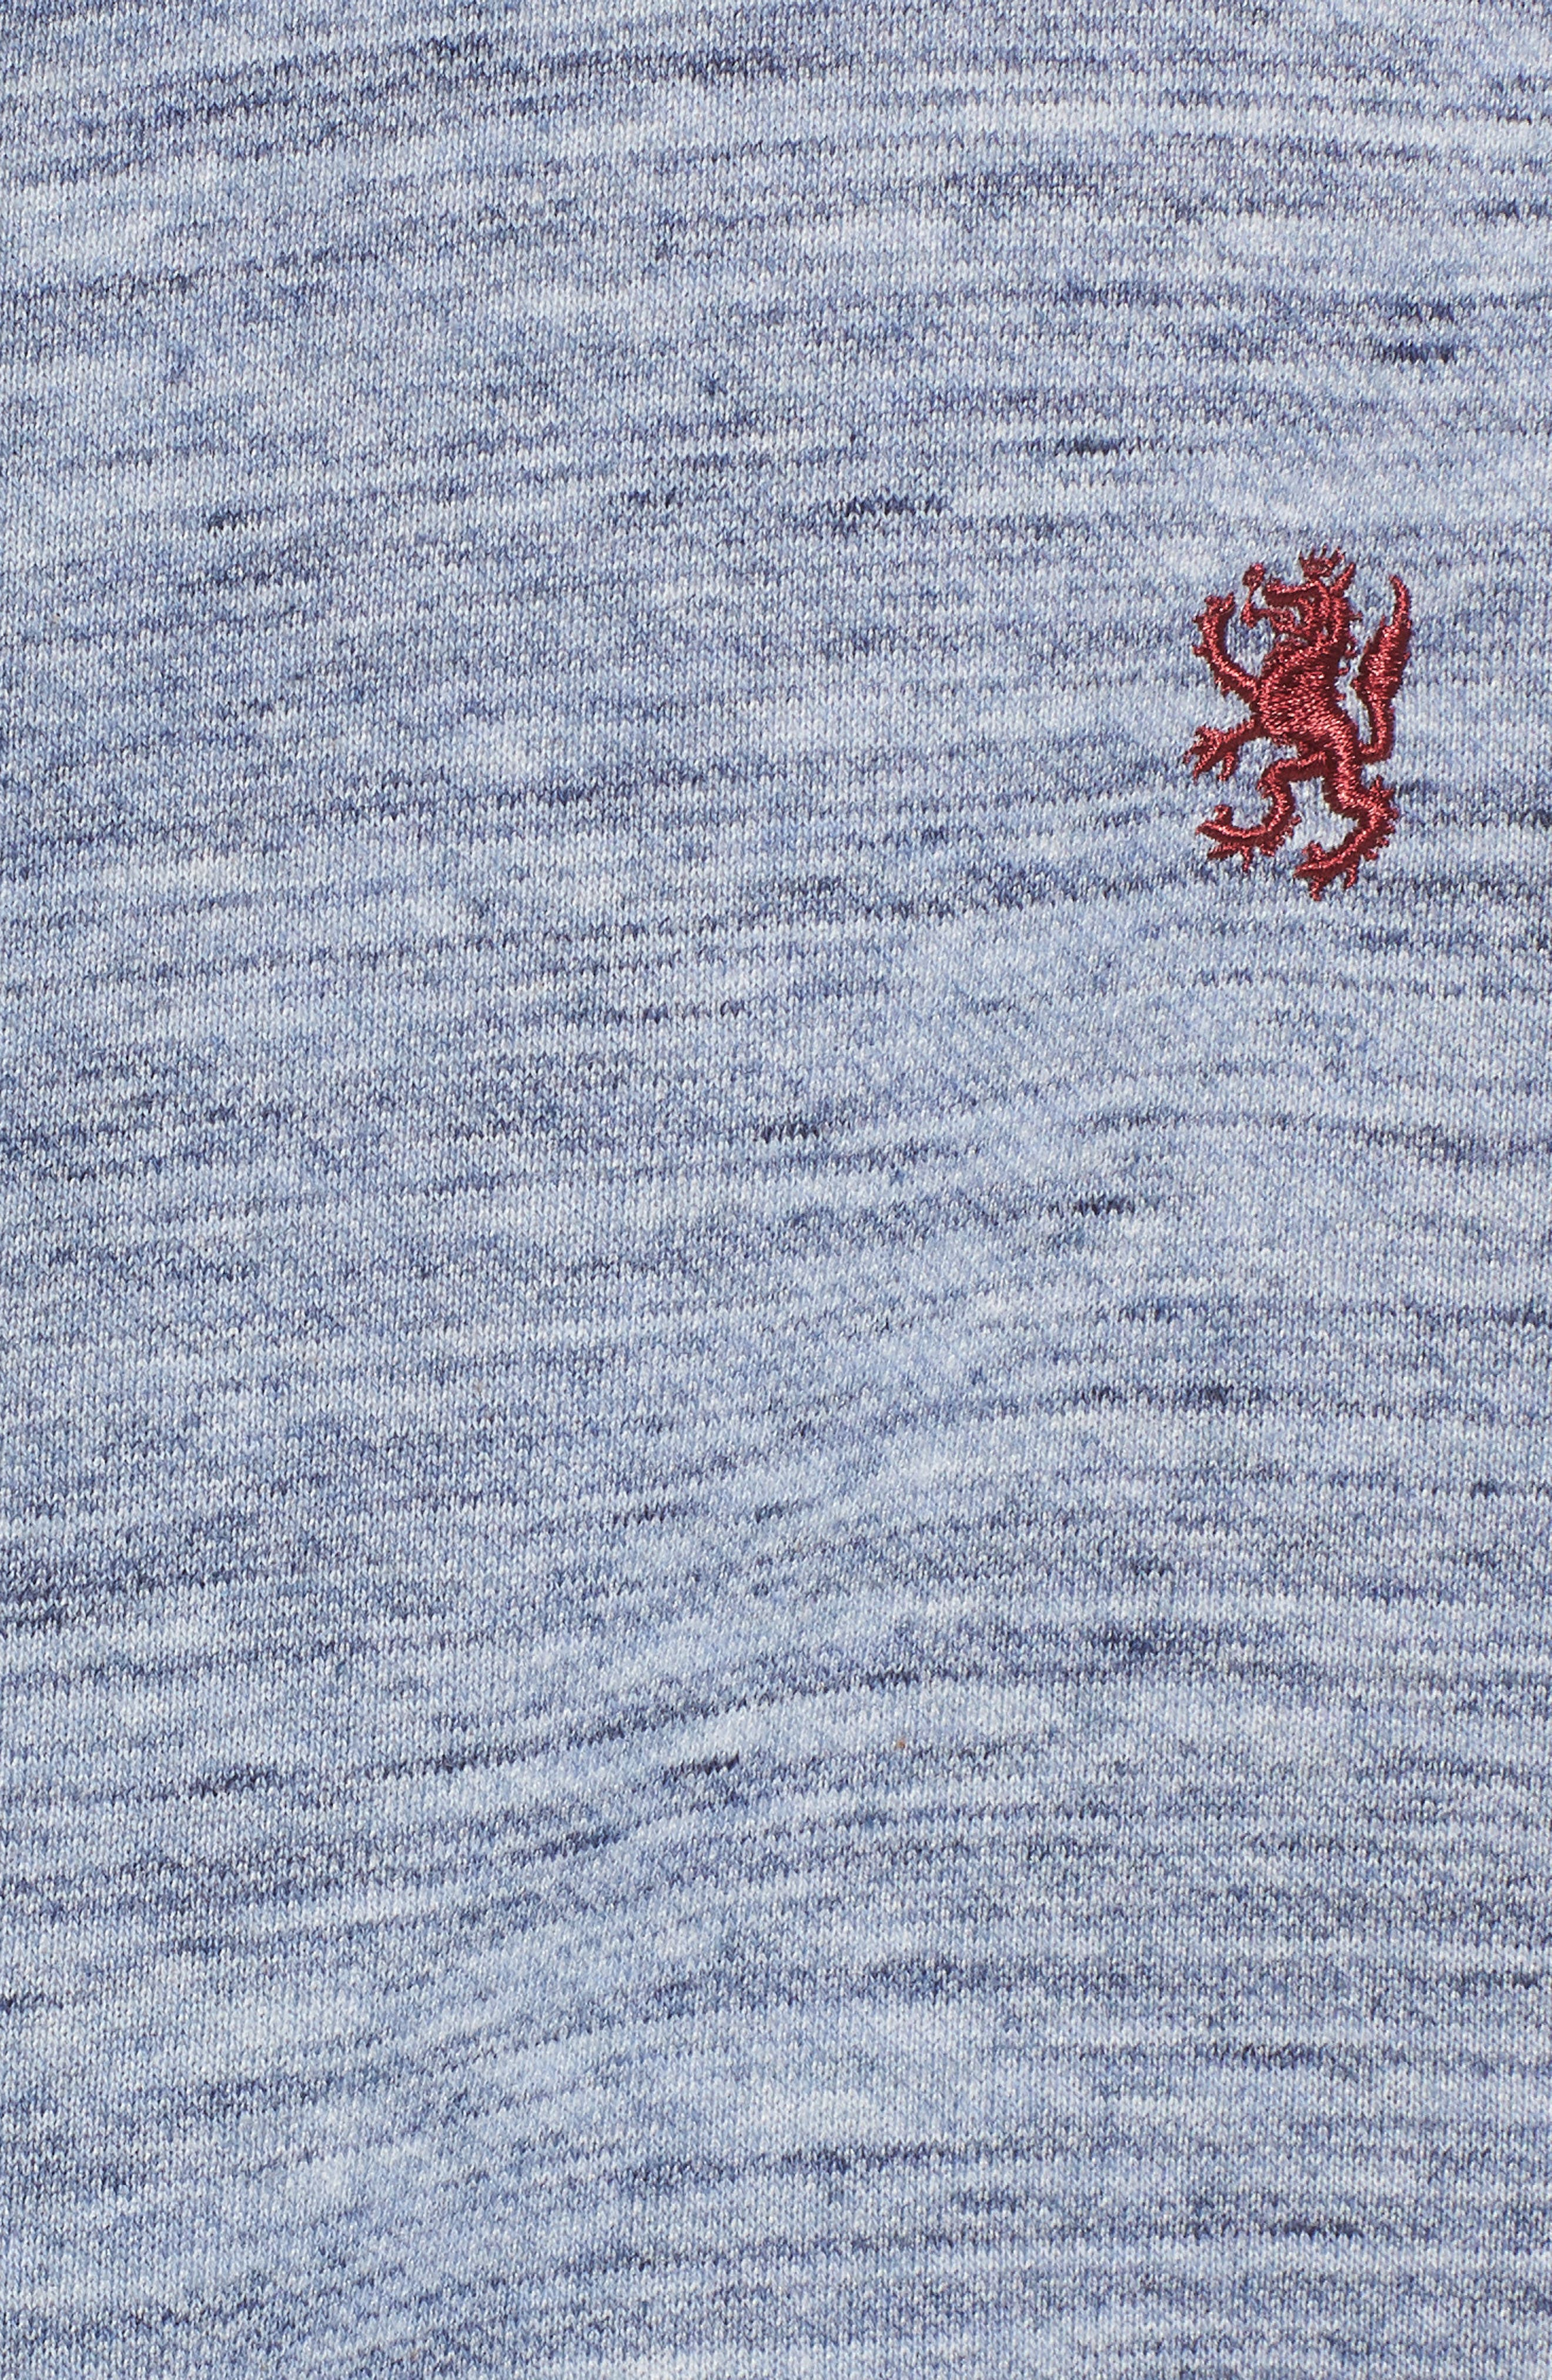 Swept In Waves Robe,                             Alternate thumbnail 5, color,                             400